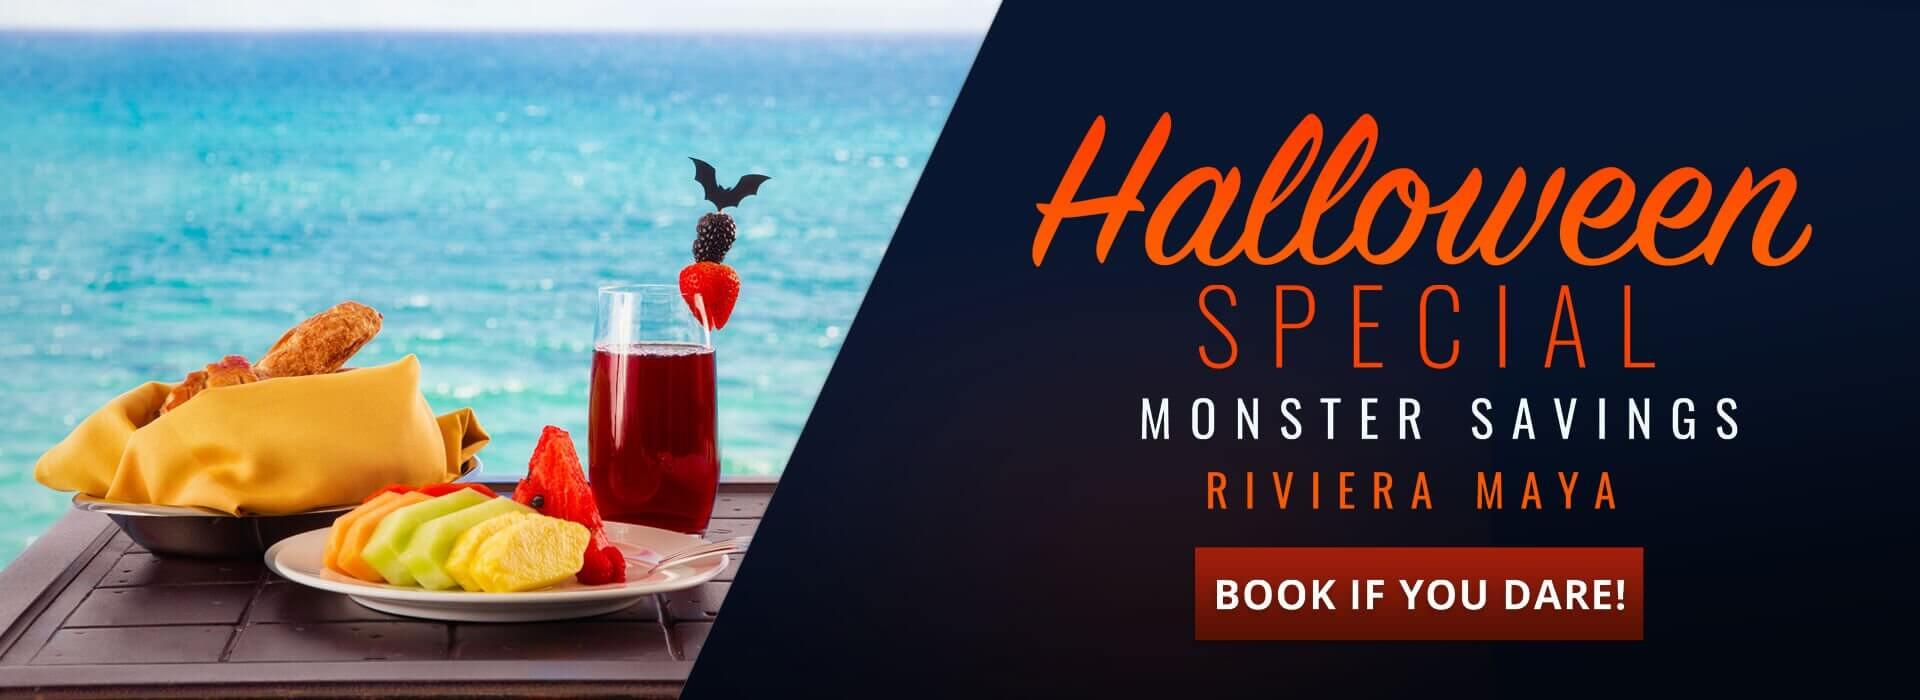 Halloween Deal in Riviera Maya!